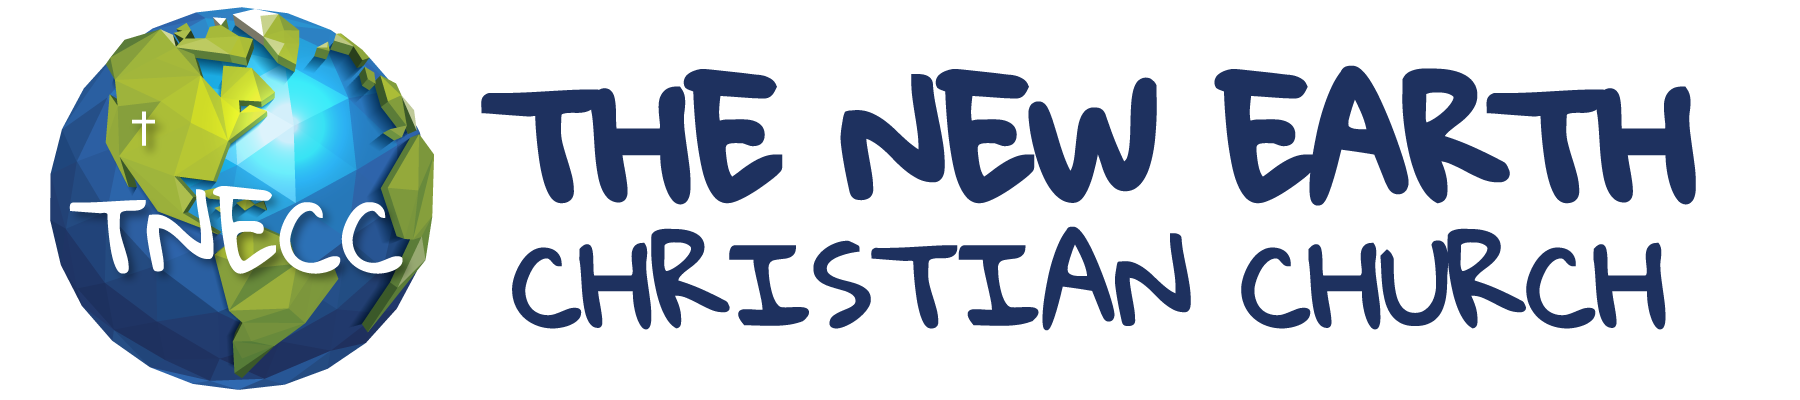 The New Earth Christian Church